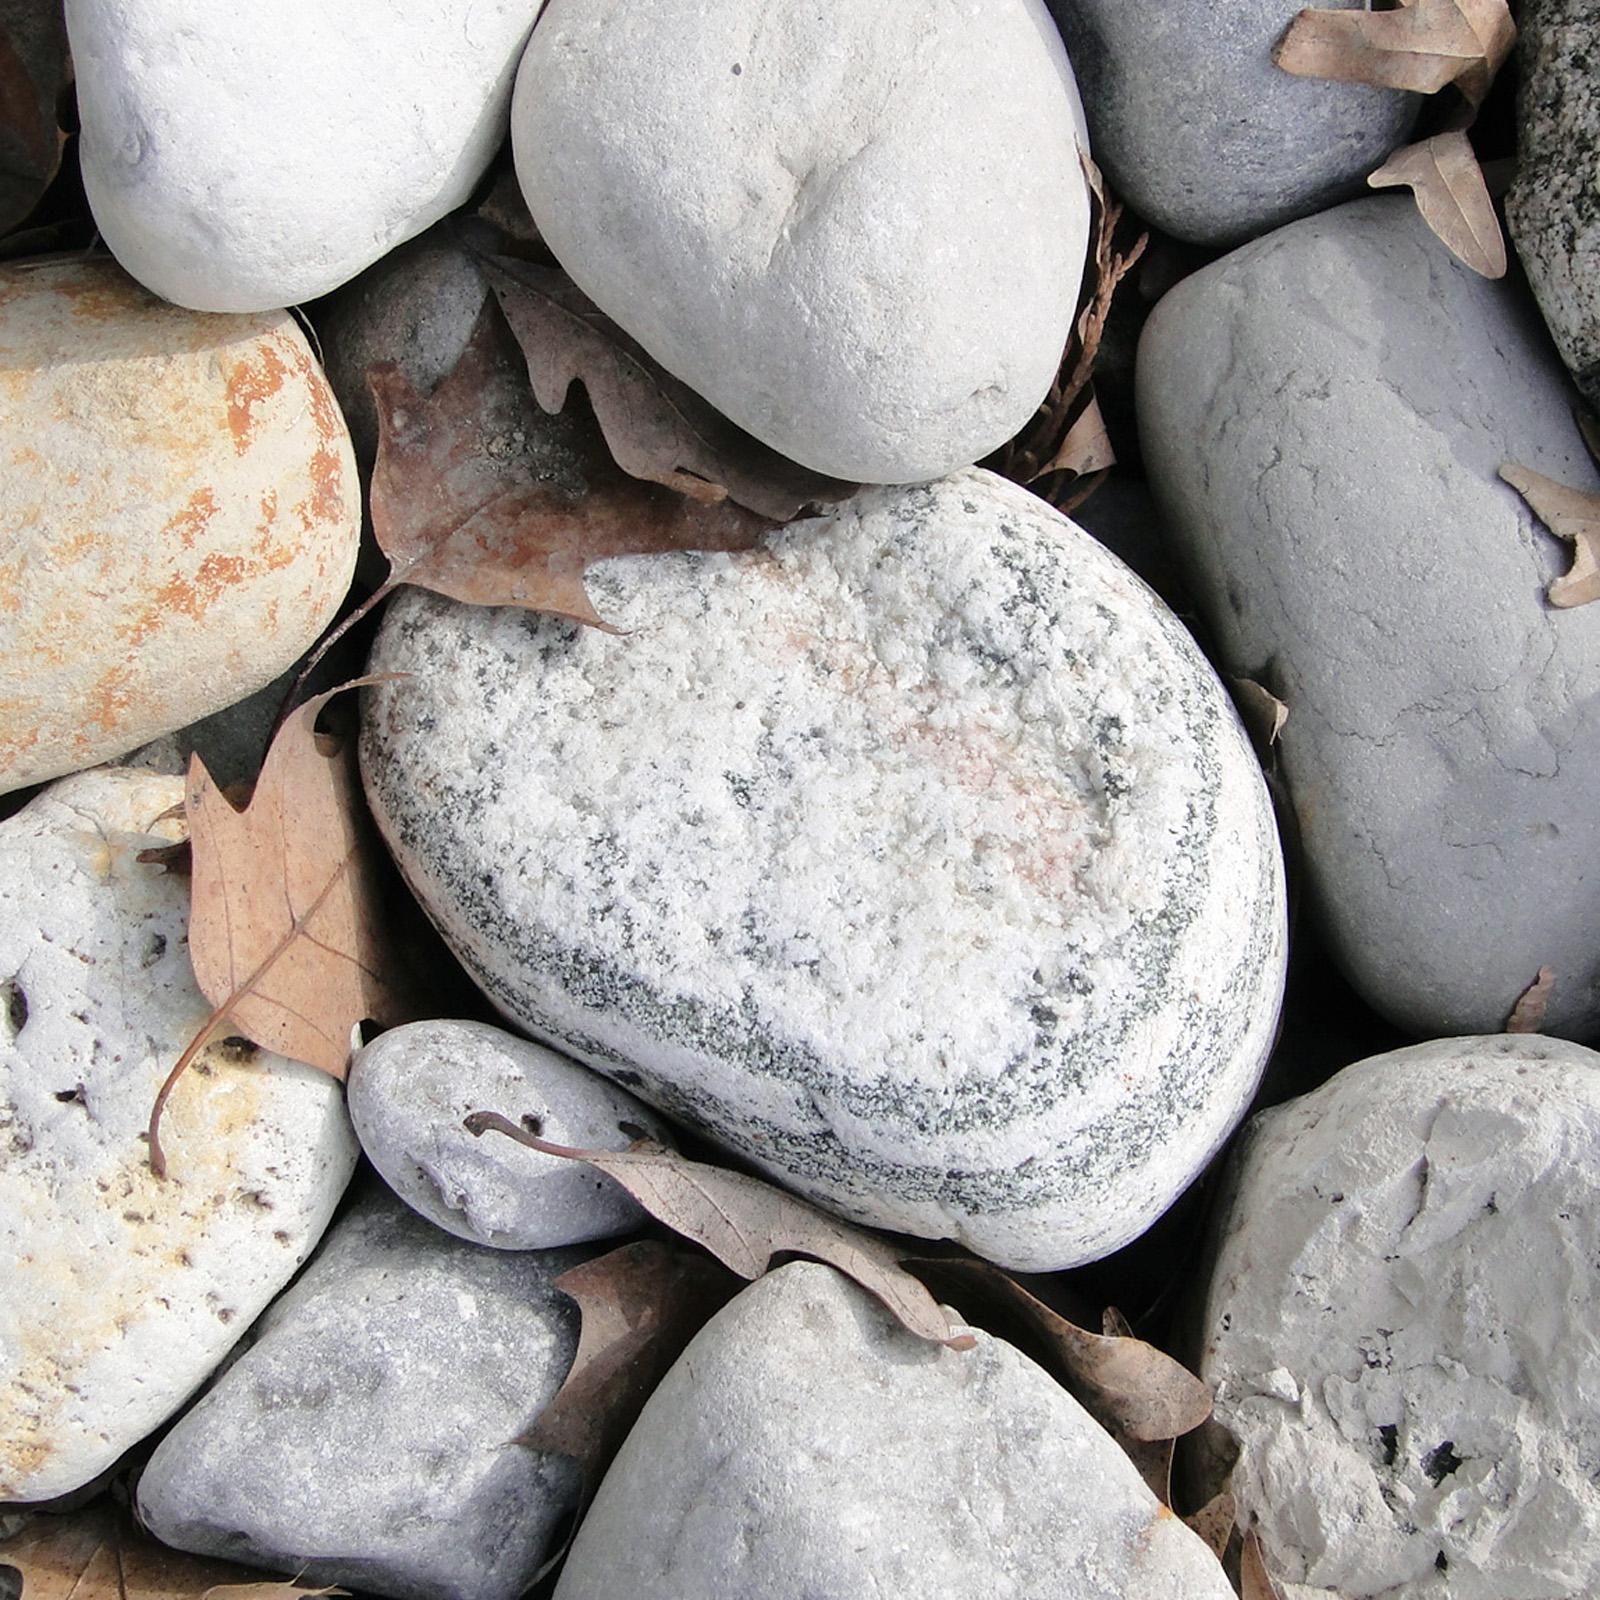 ig rocks.jpg